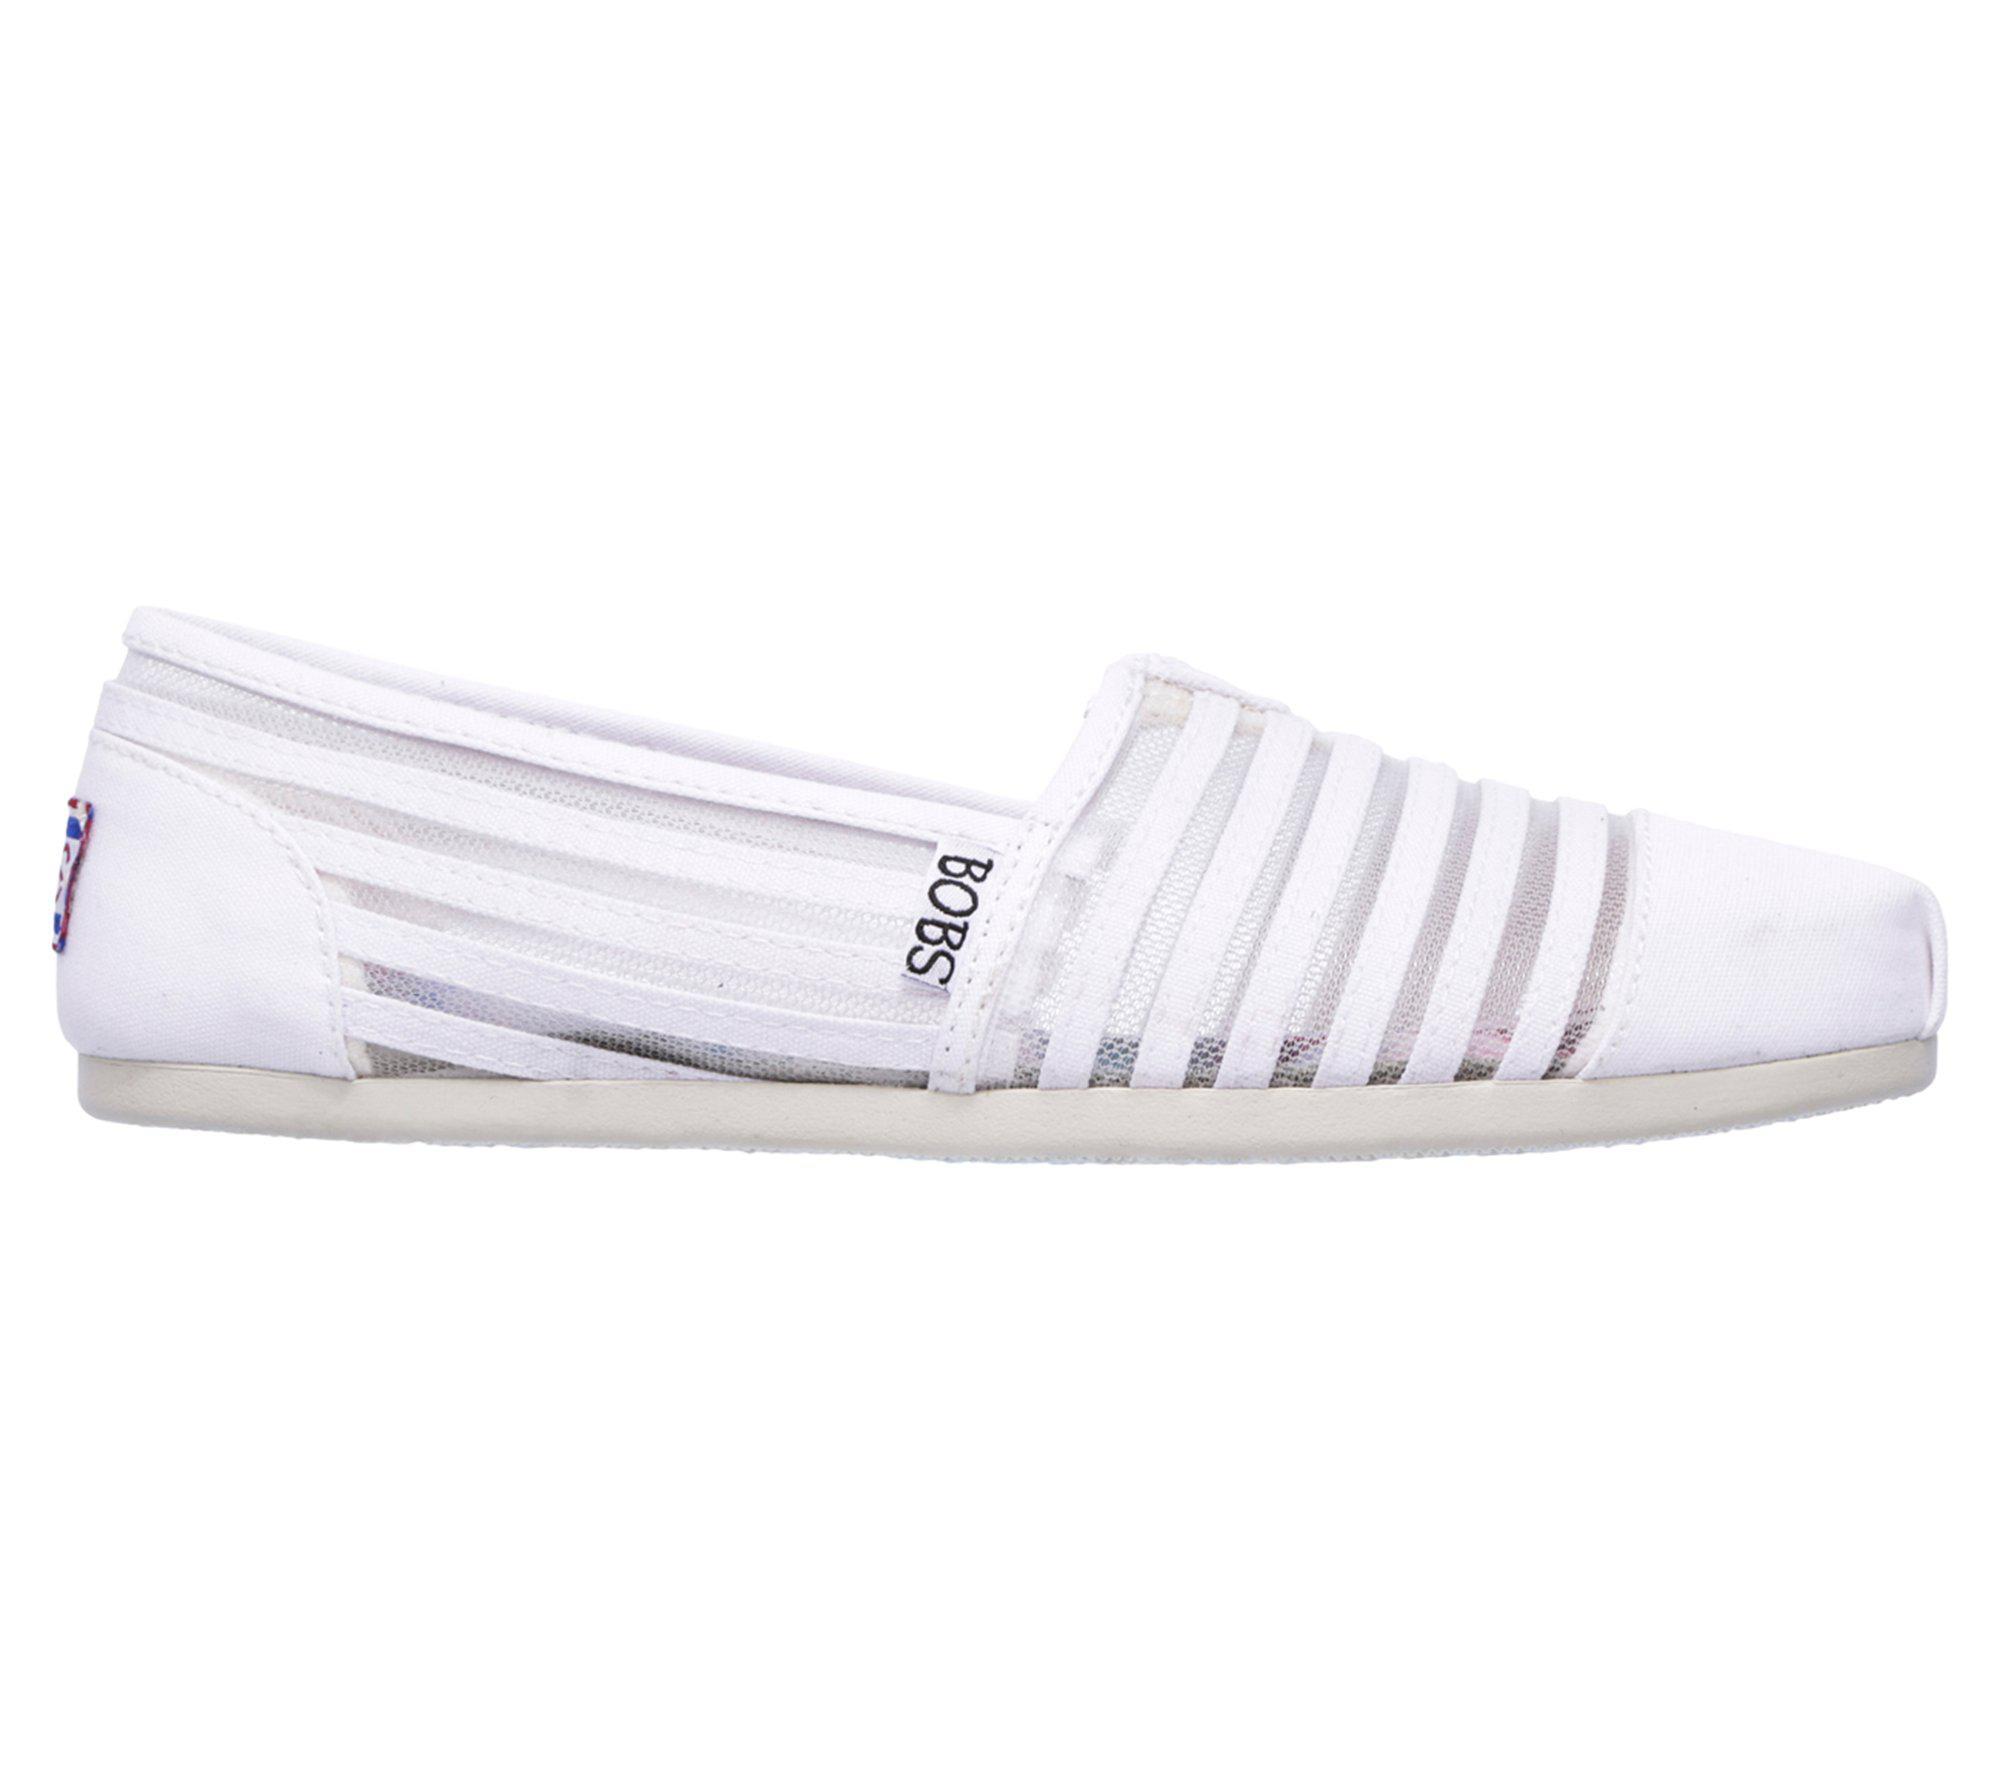 8f7ebd6678 Lyst - Skechers Bobs Plush - Adorbs in White